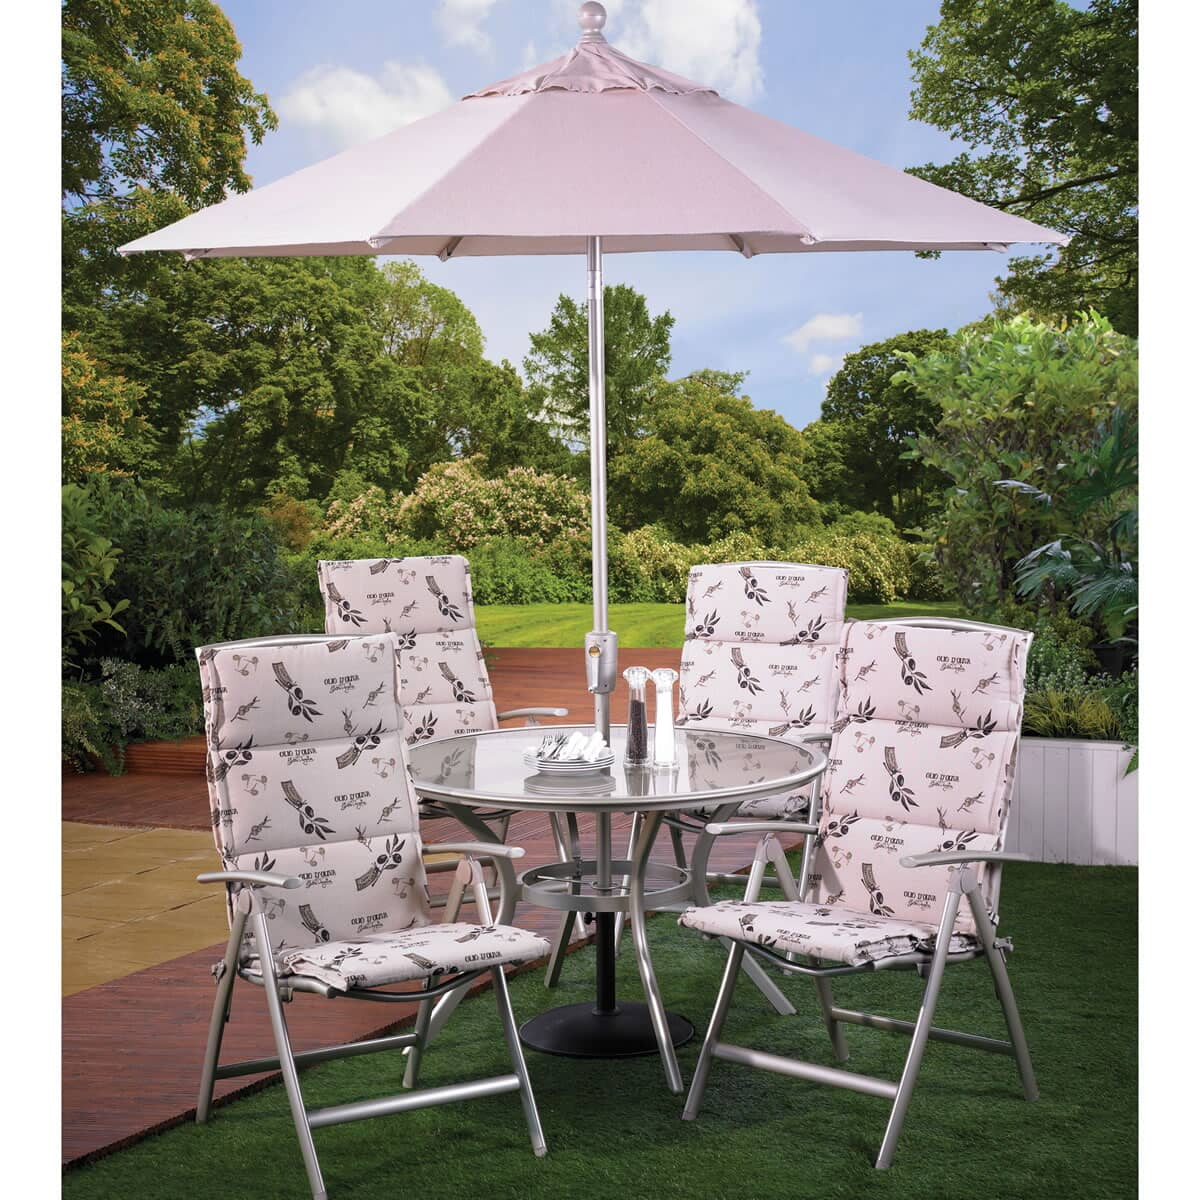 Gardenfurnitureworld mobile for Outdoor furniture darwin